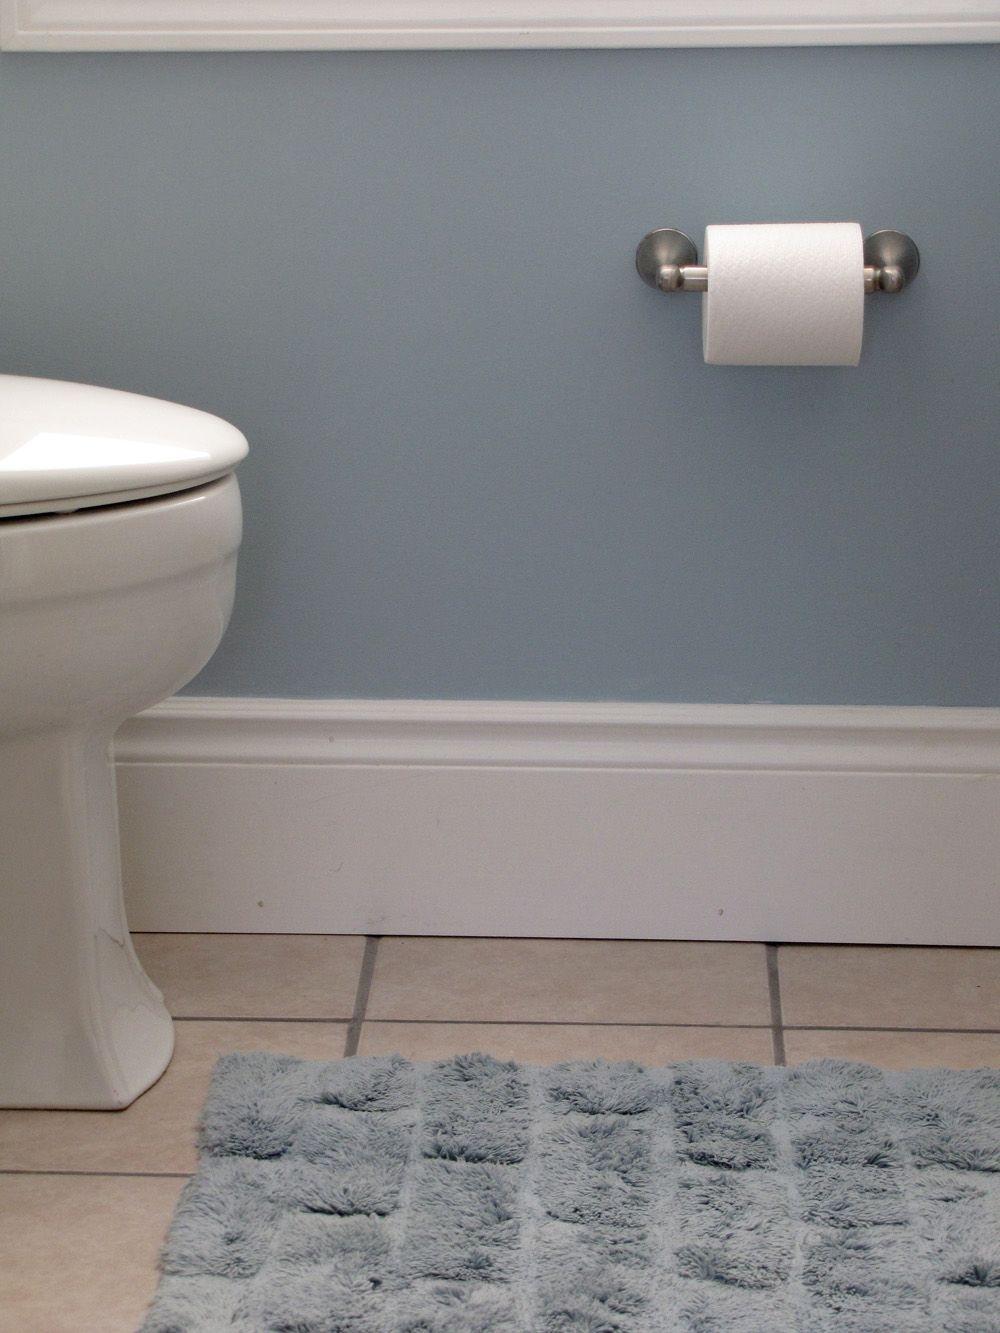 Behr Ozone Bathroom Colors Small Bathroom Paint Colors Bathroom Paint Colors Behr